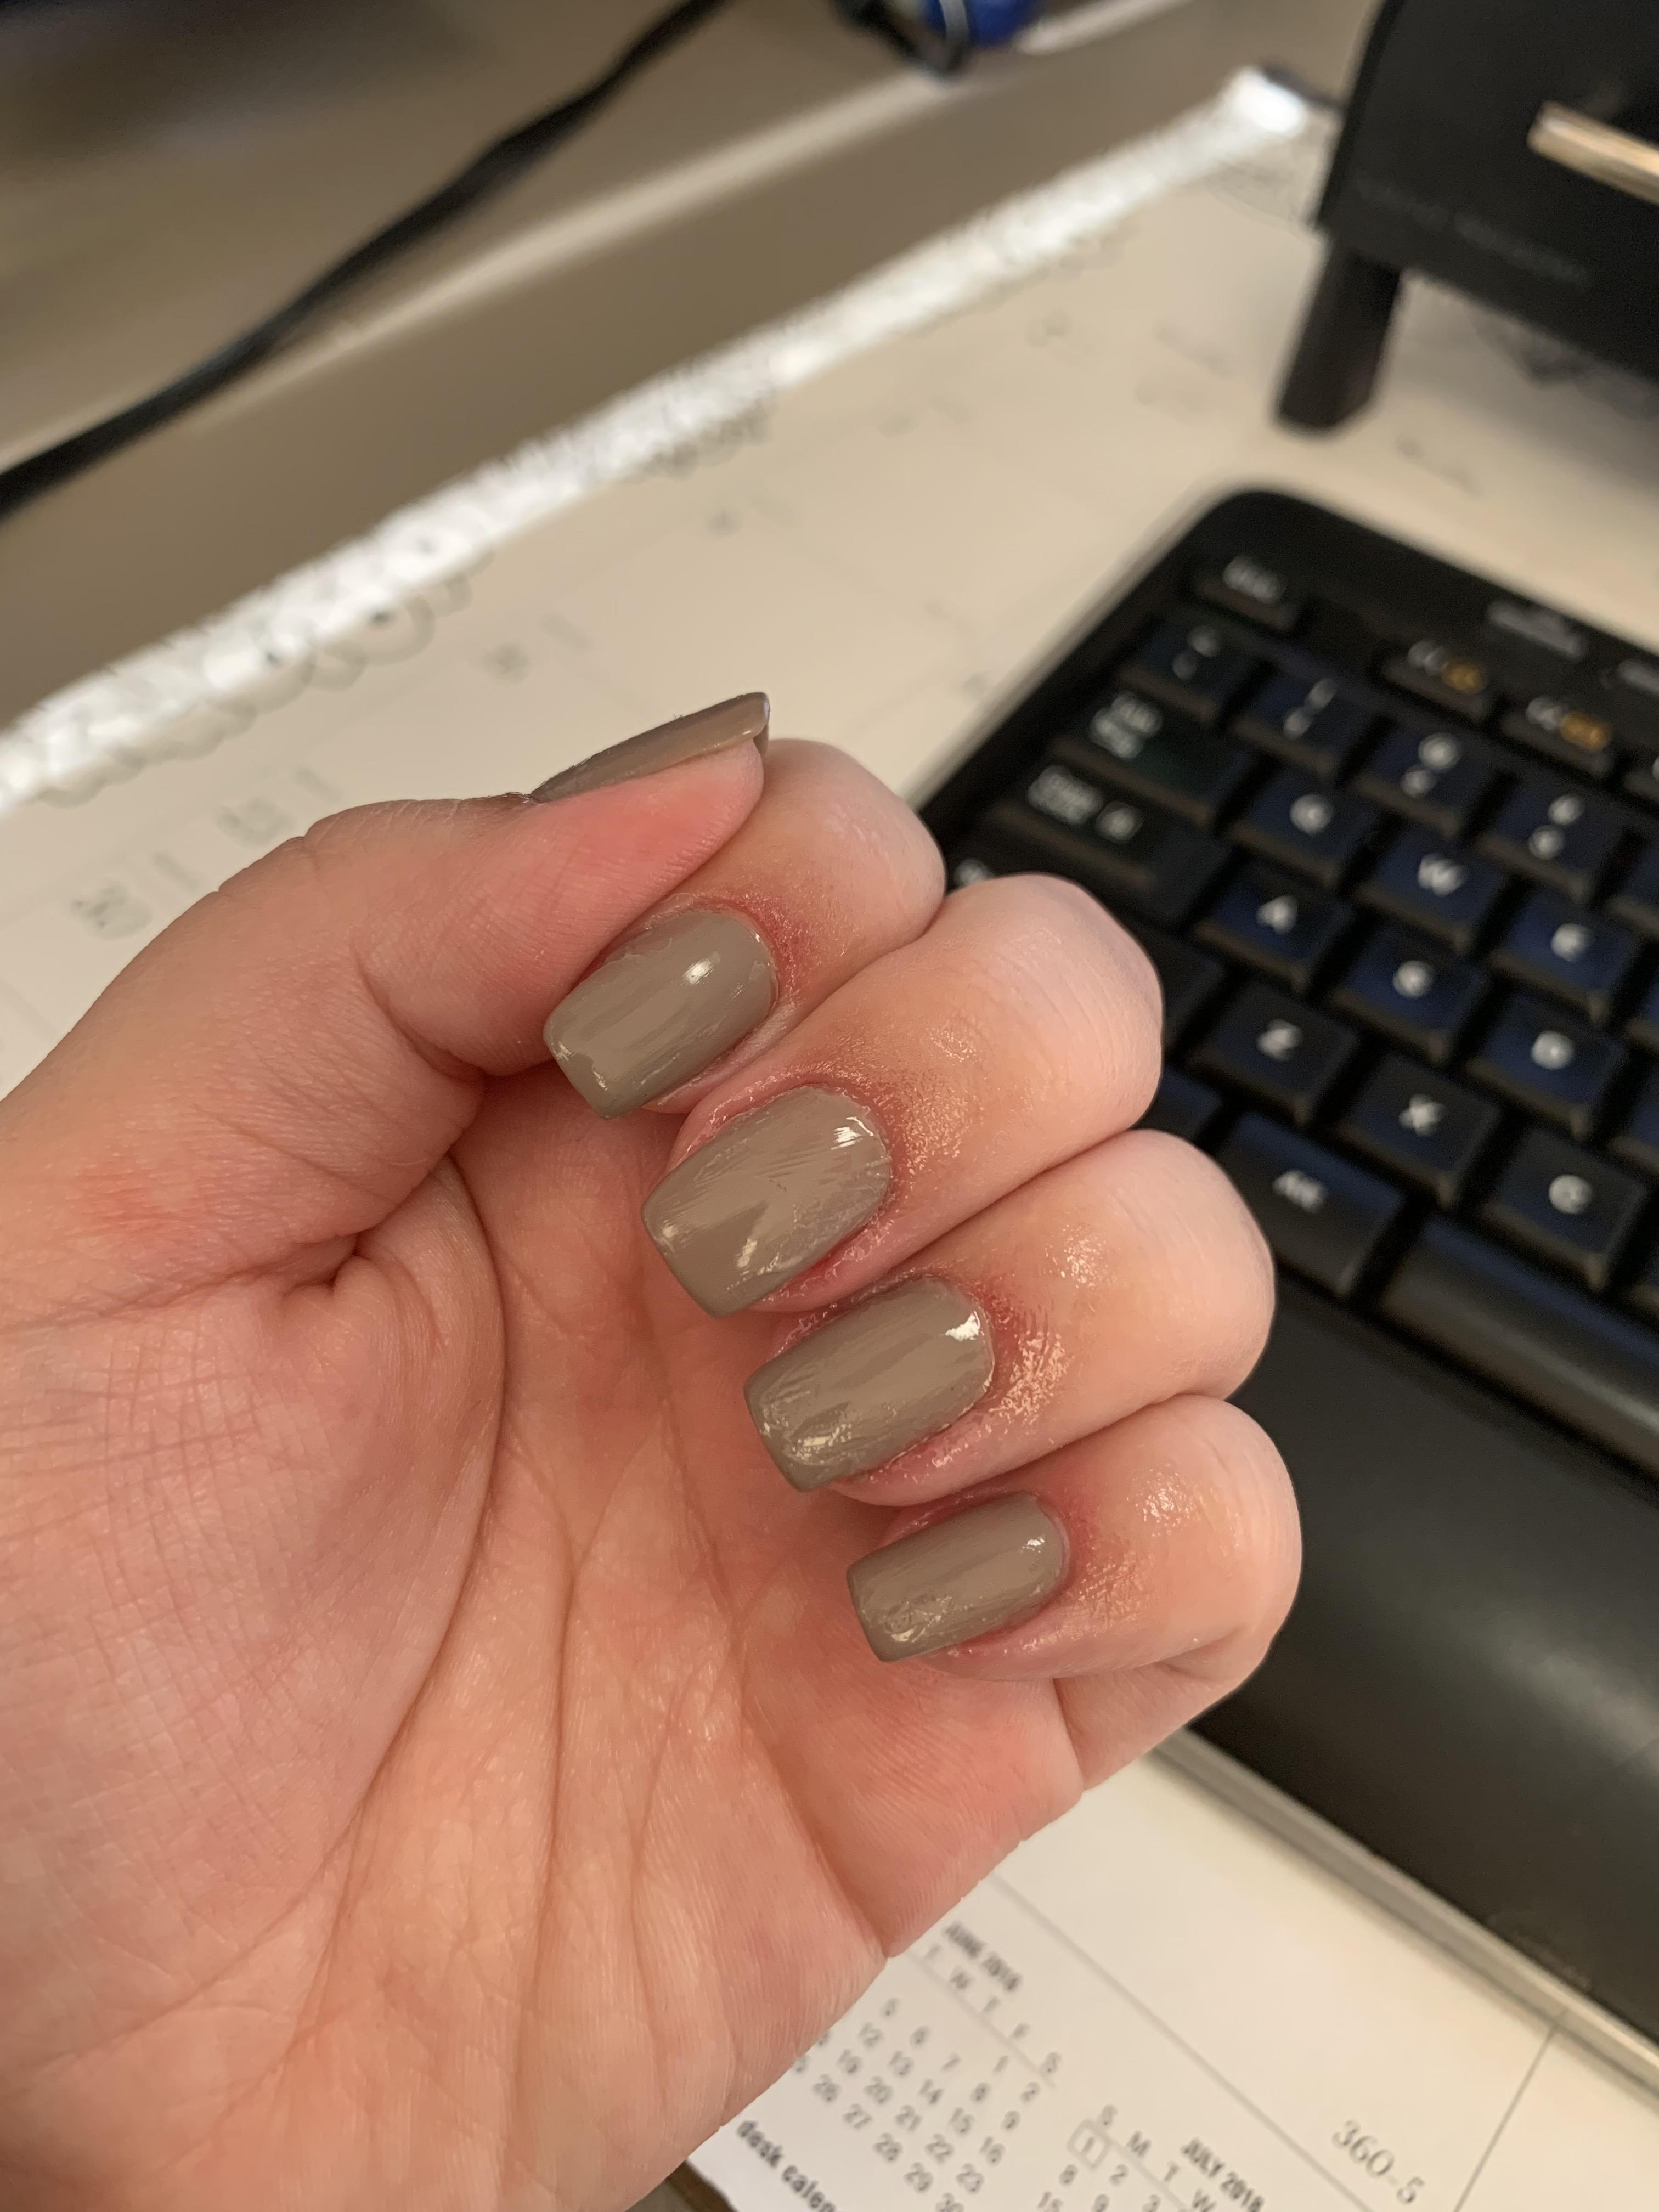 Nails Around Me : nails, around, Manicure, Night, Bleeding, Advice, Around, Nails?, Right, Vaseline, Nails